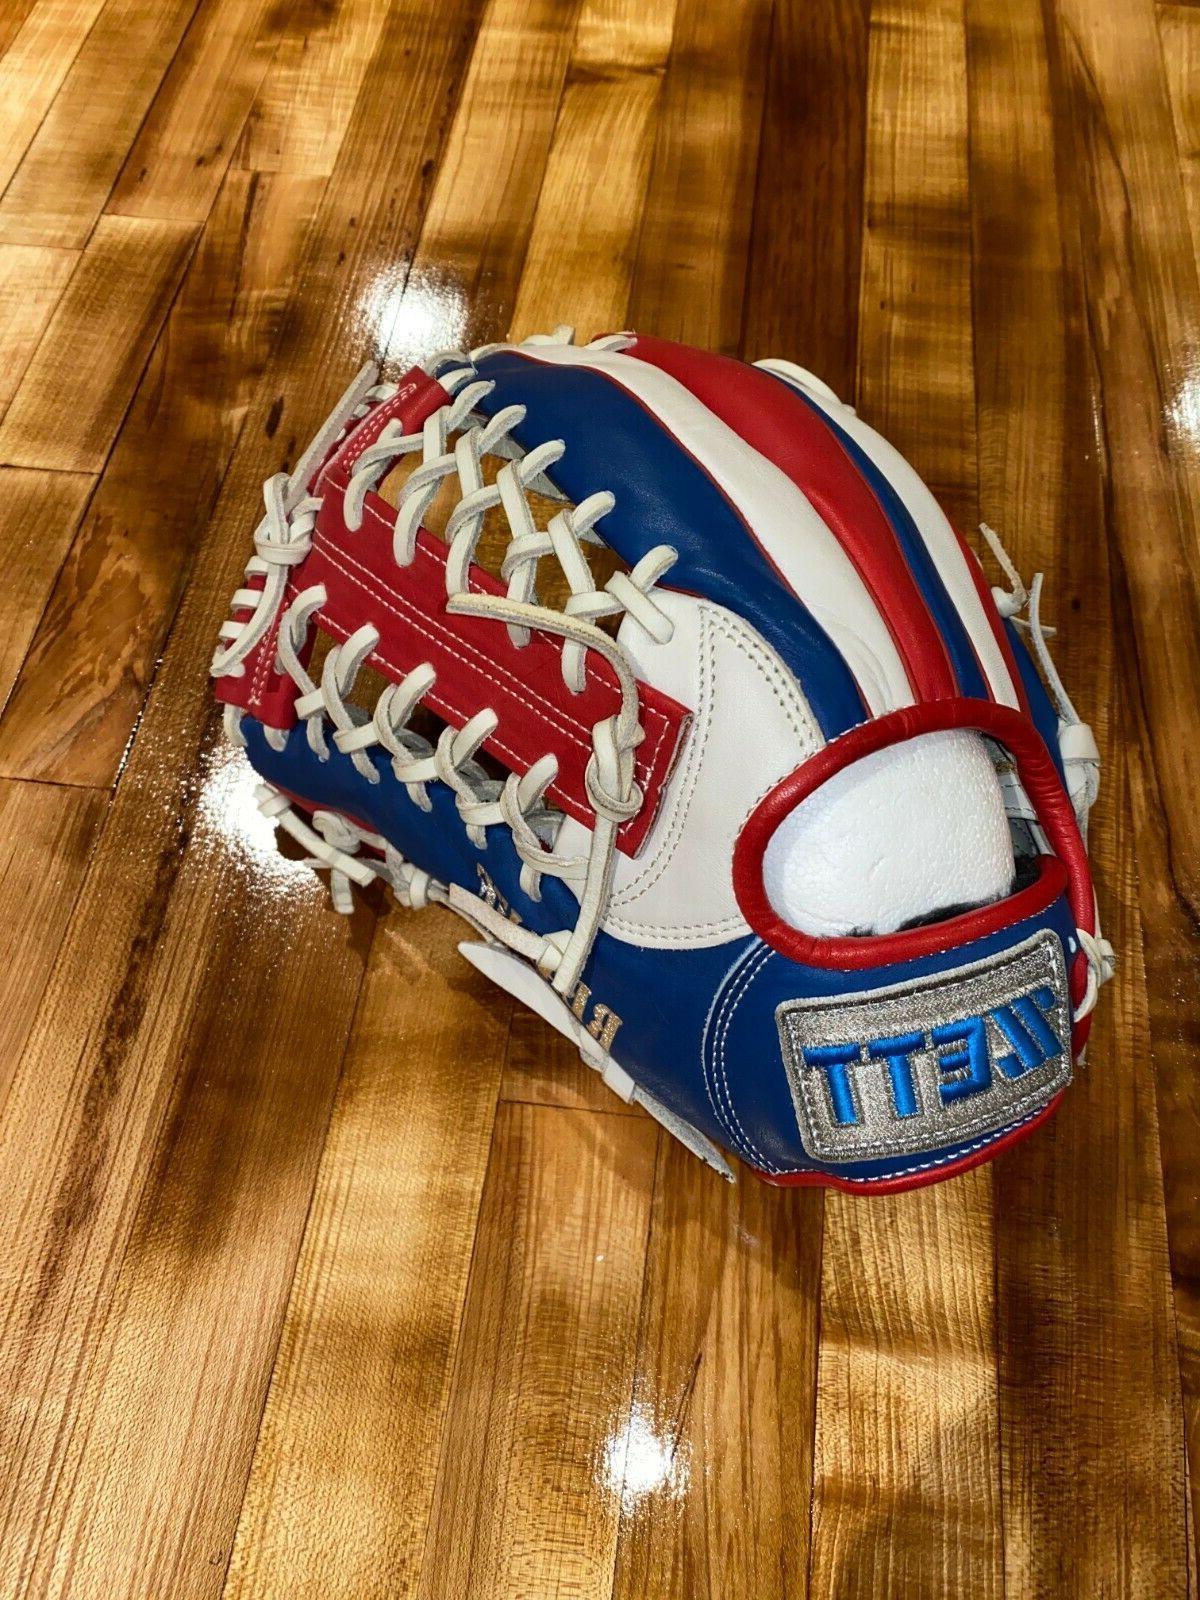 new baseball softball 11 5 glove